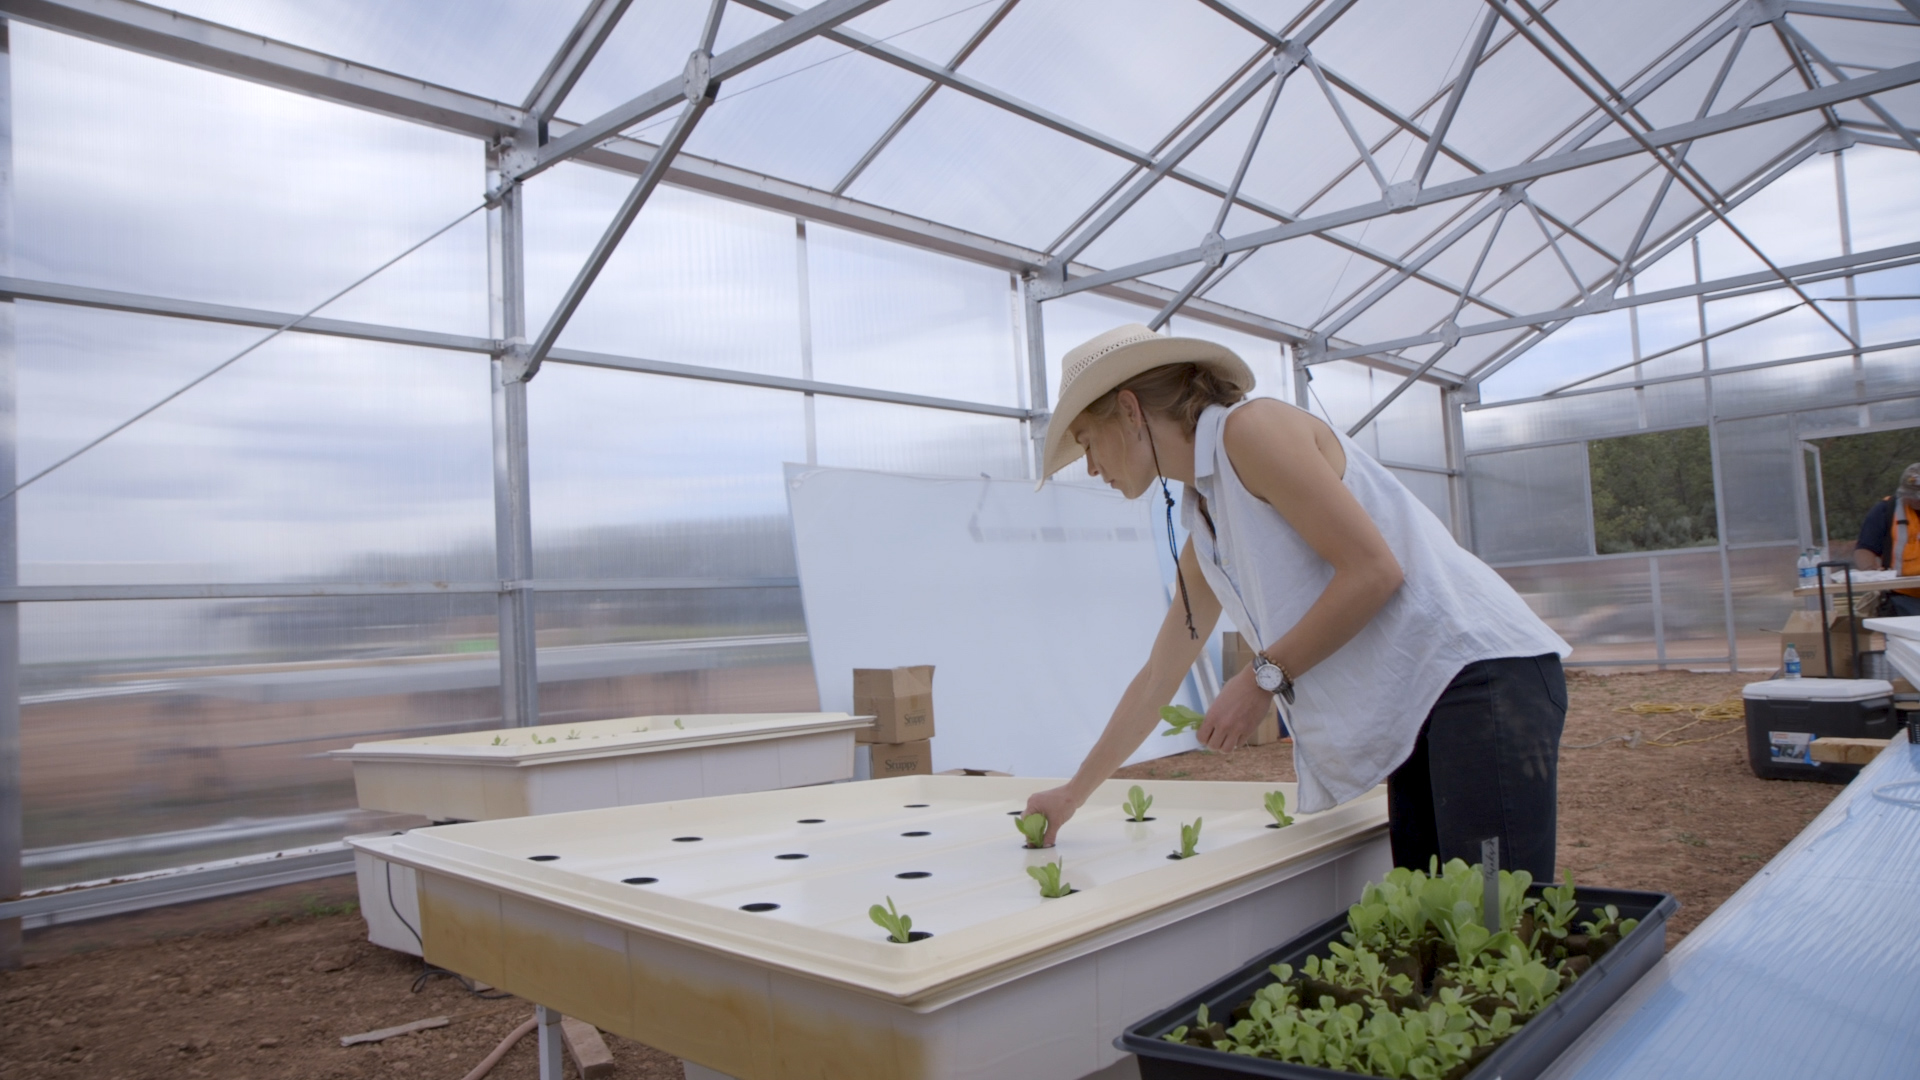 Indige-FEWSS graduate student Bekah Waller planting lettuce in a hydroponic system.